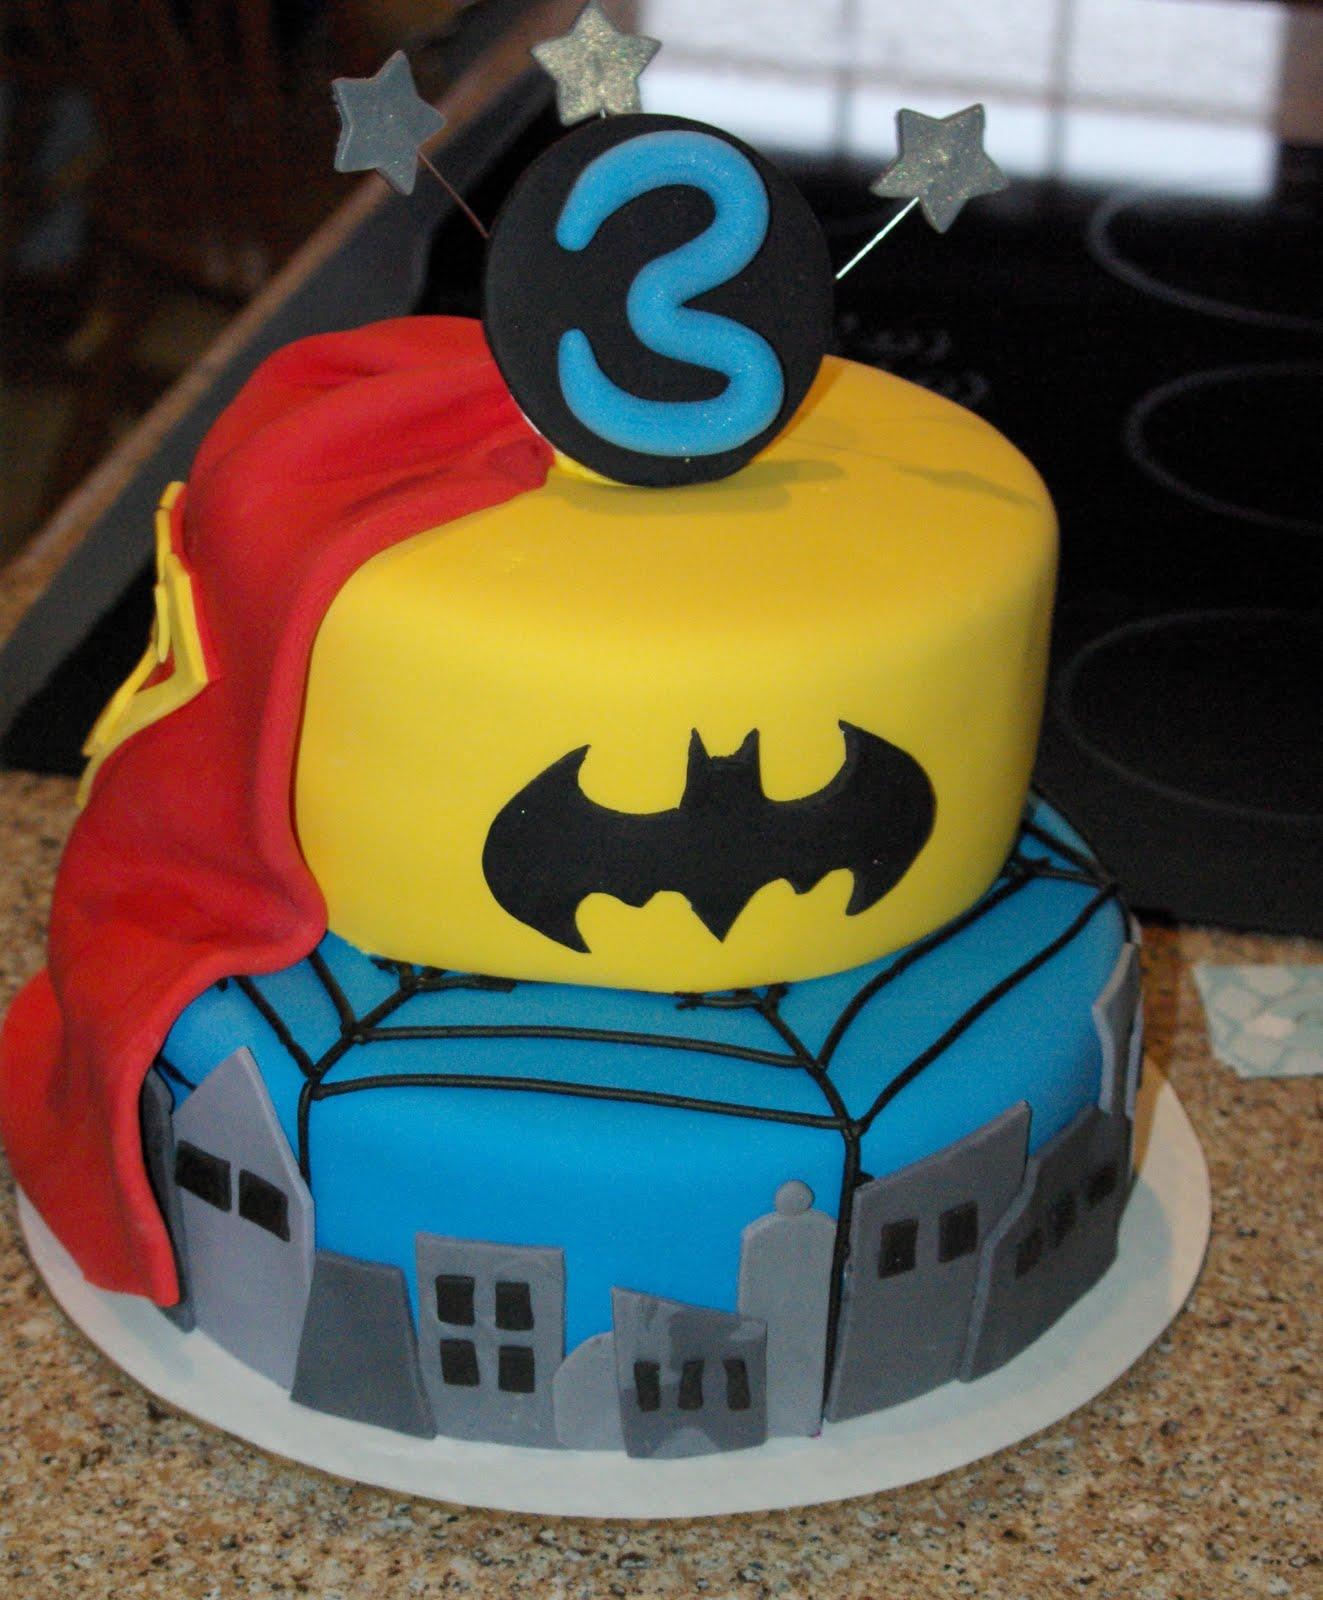 Super Hero: Super Hero Cake